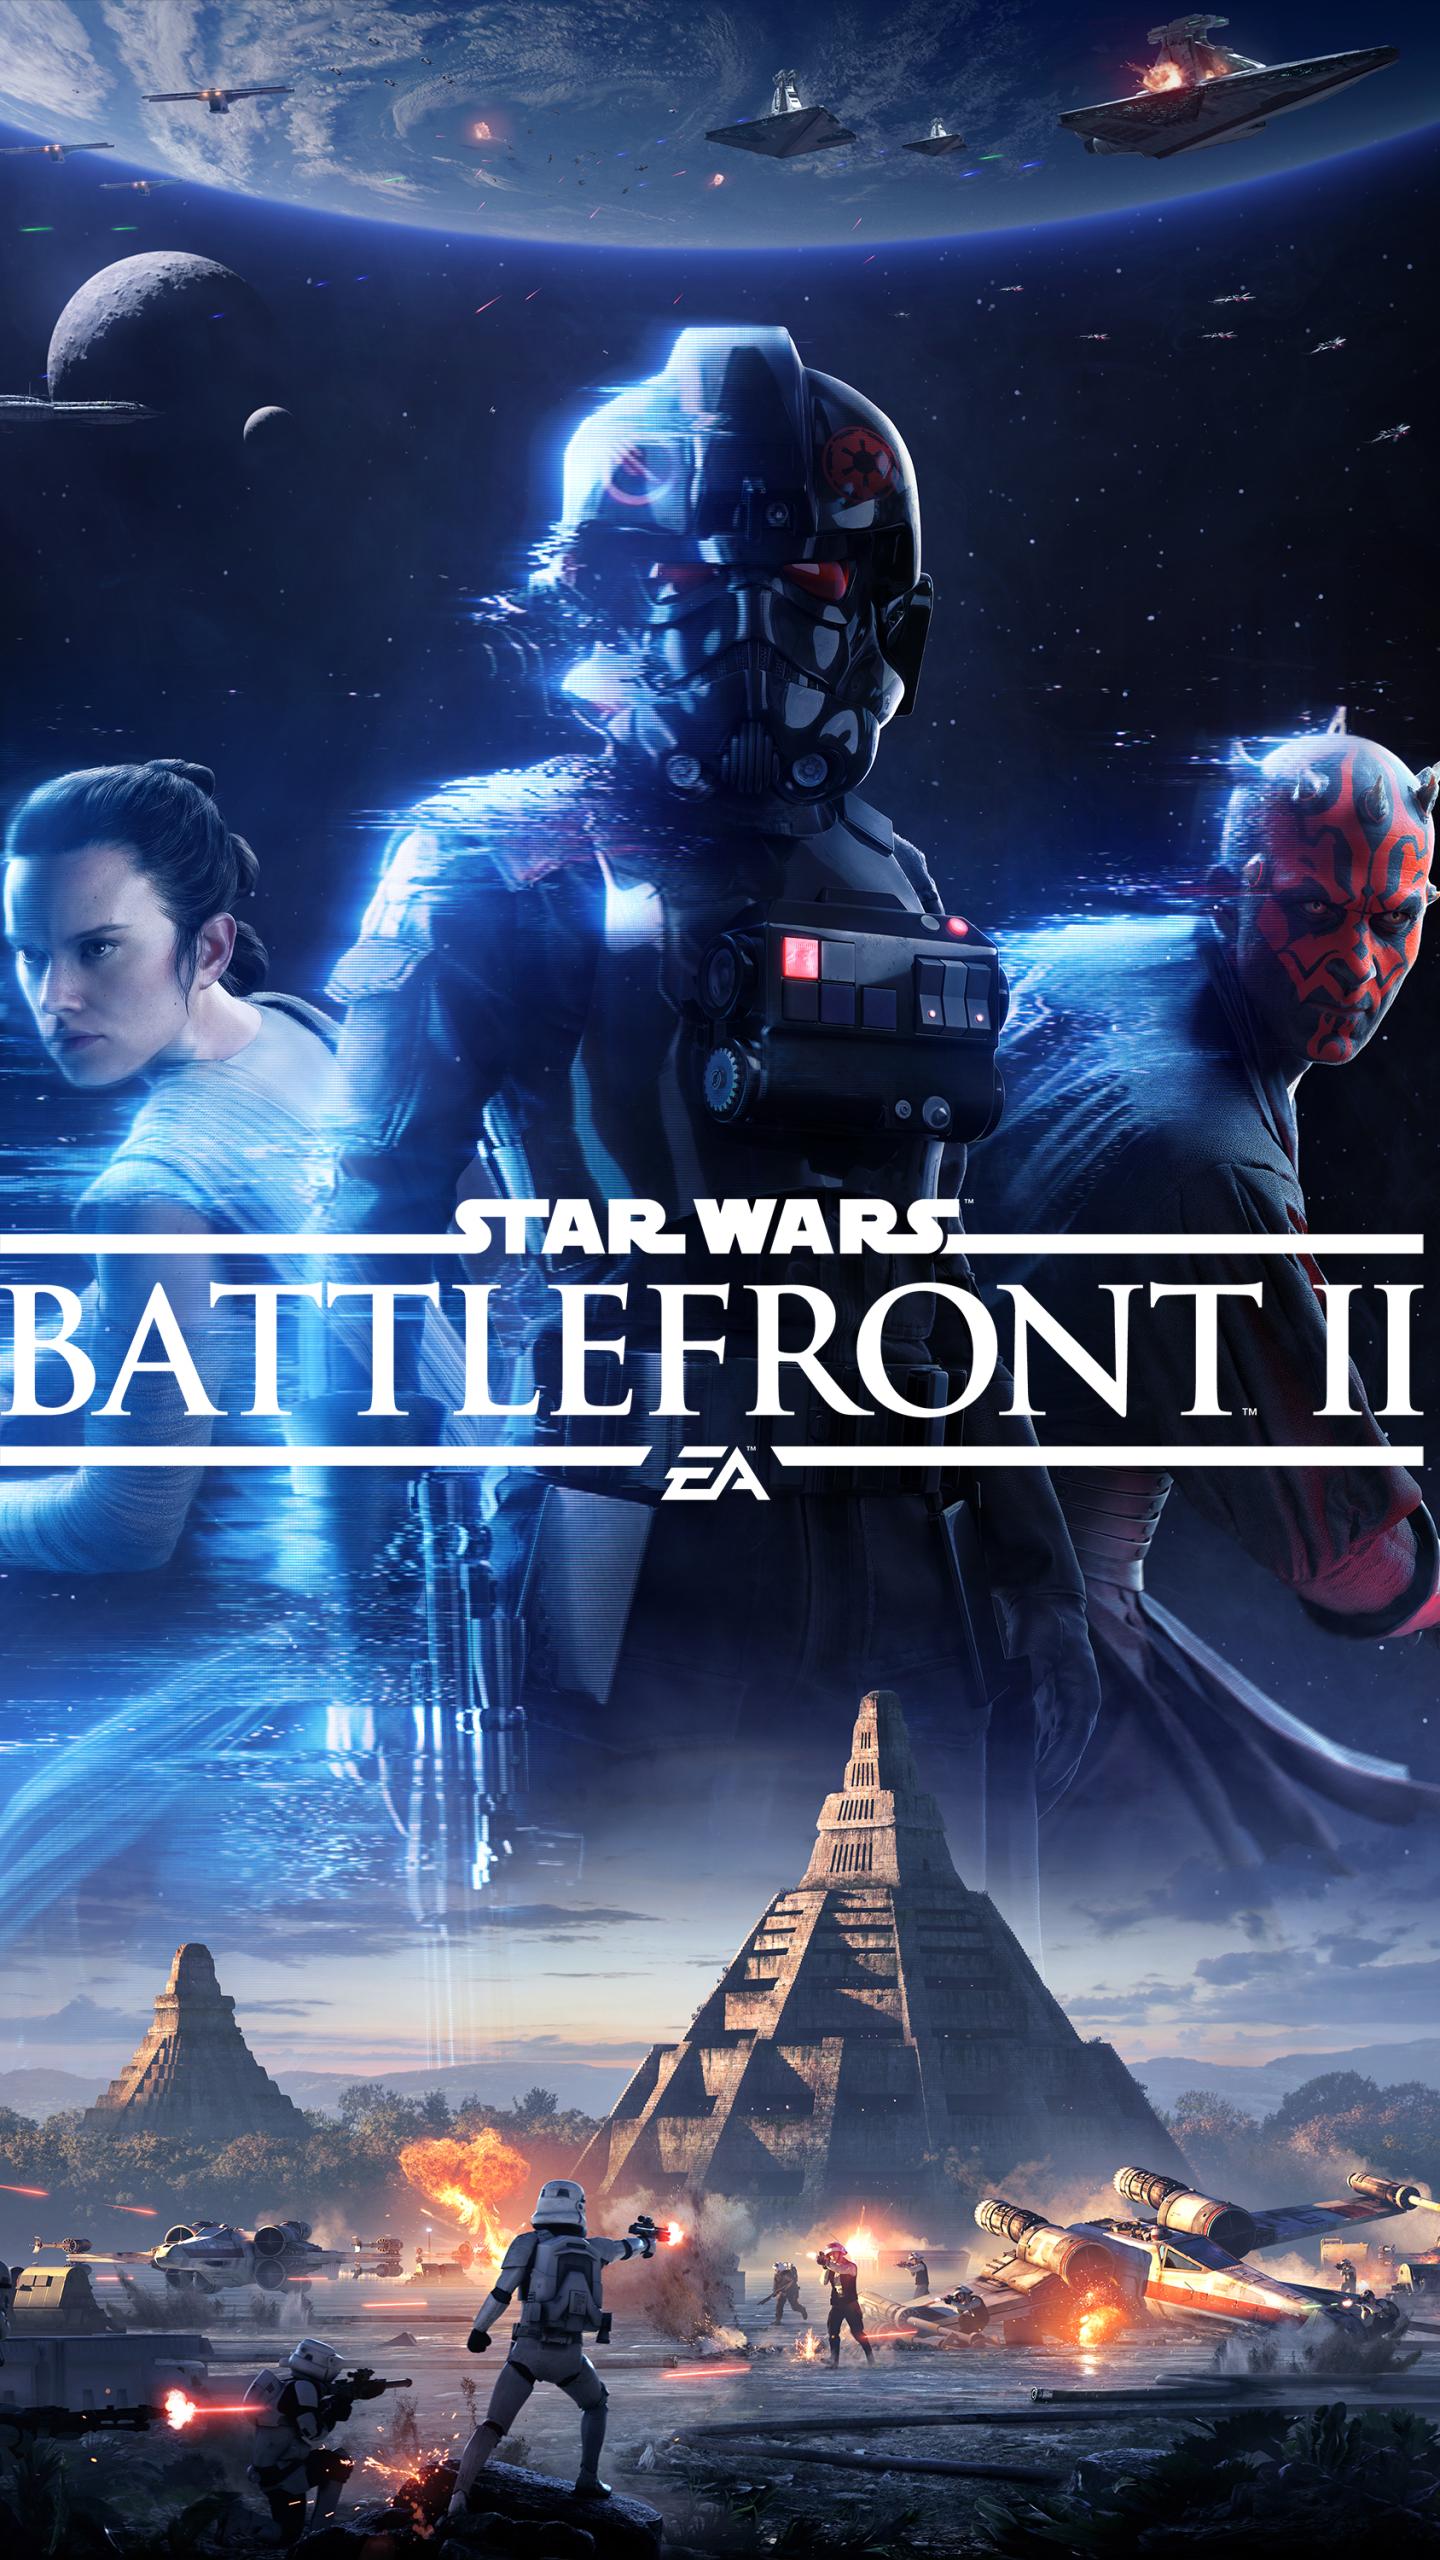 iphone 6 - video game/star wars battlefront ii (2017) - wallpaper